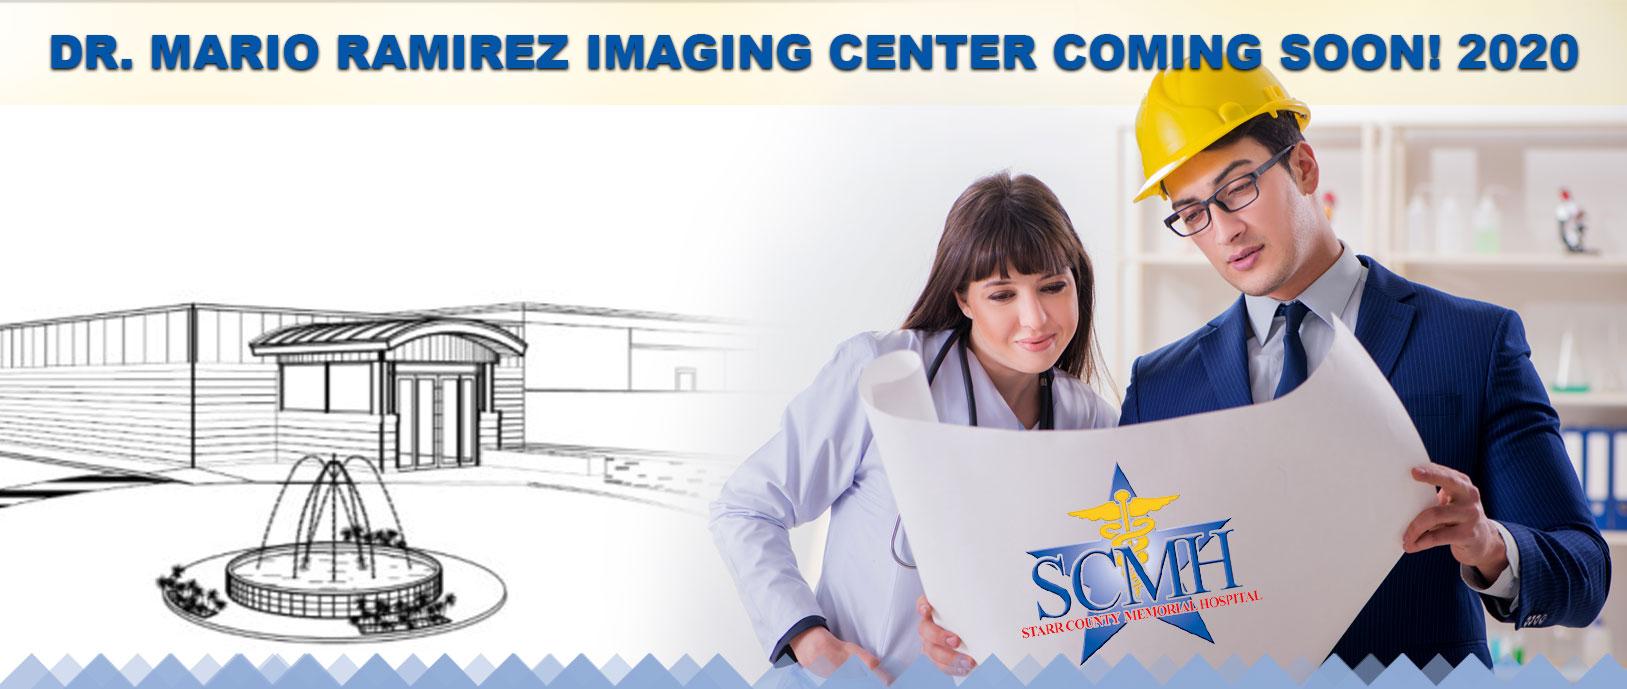 Dr. Mario Ramirez imaging center coming soon! 2020